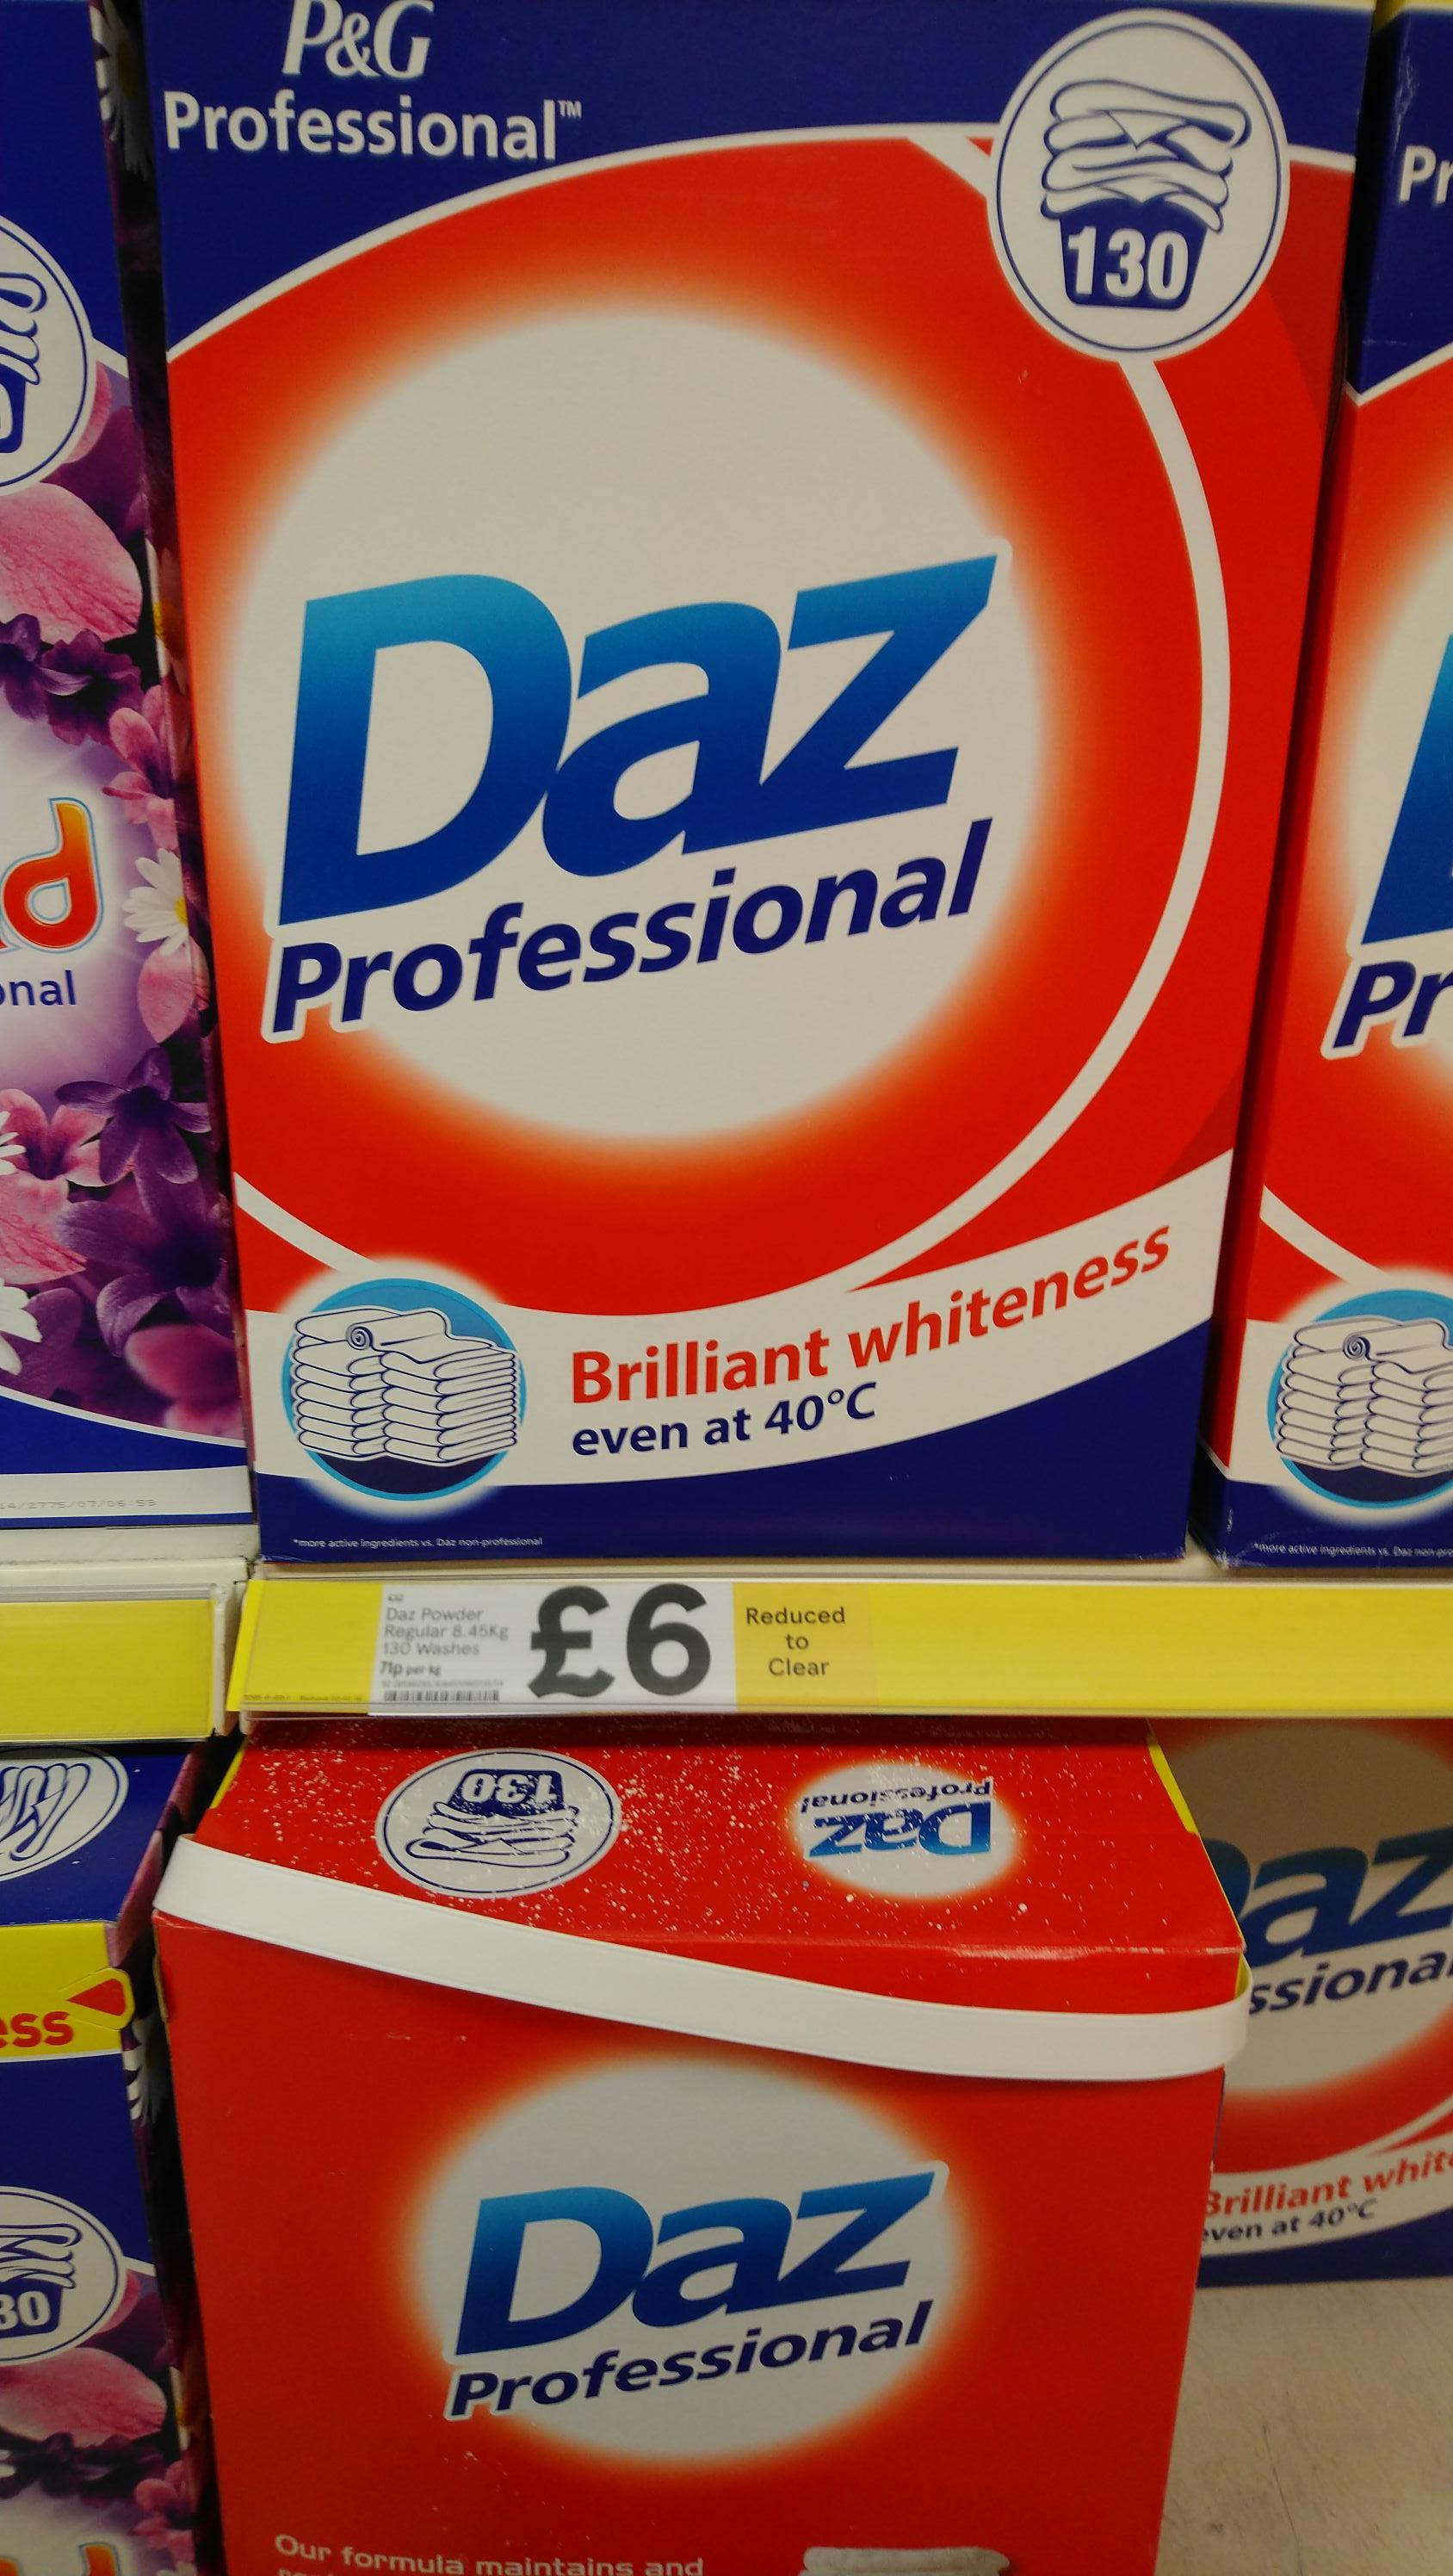 Daz professional 130 wash £6 instore @ tesco St Stephens hull